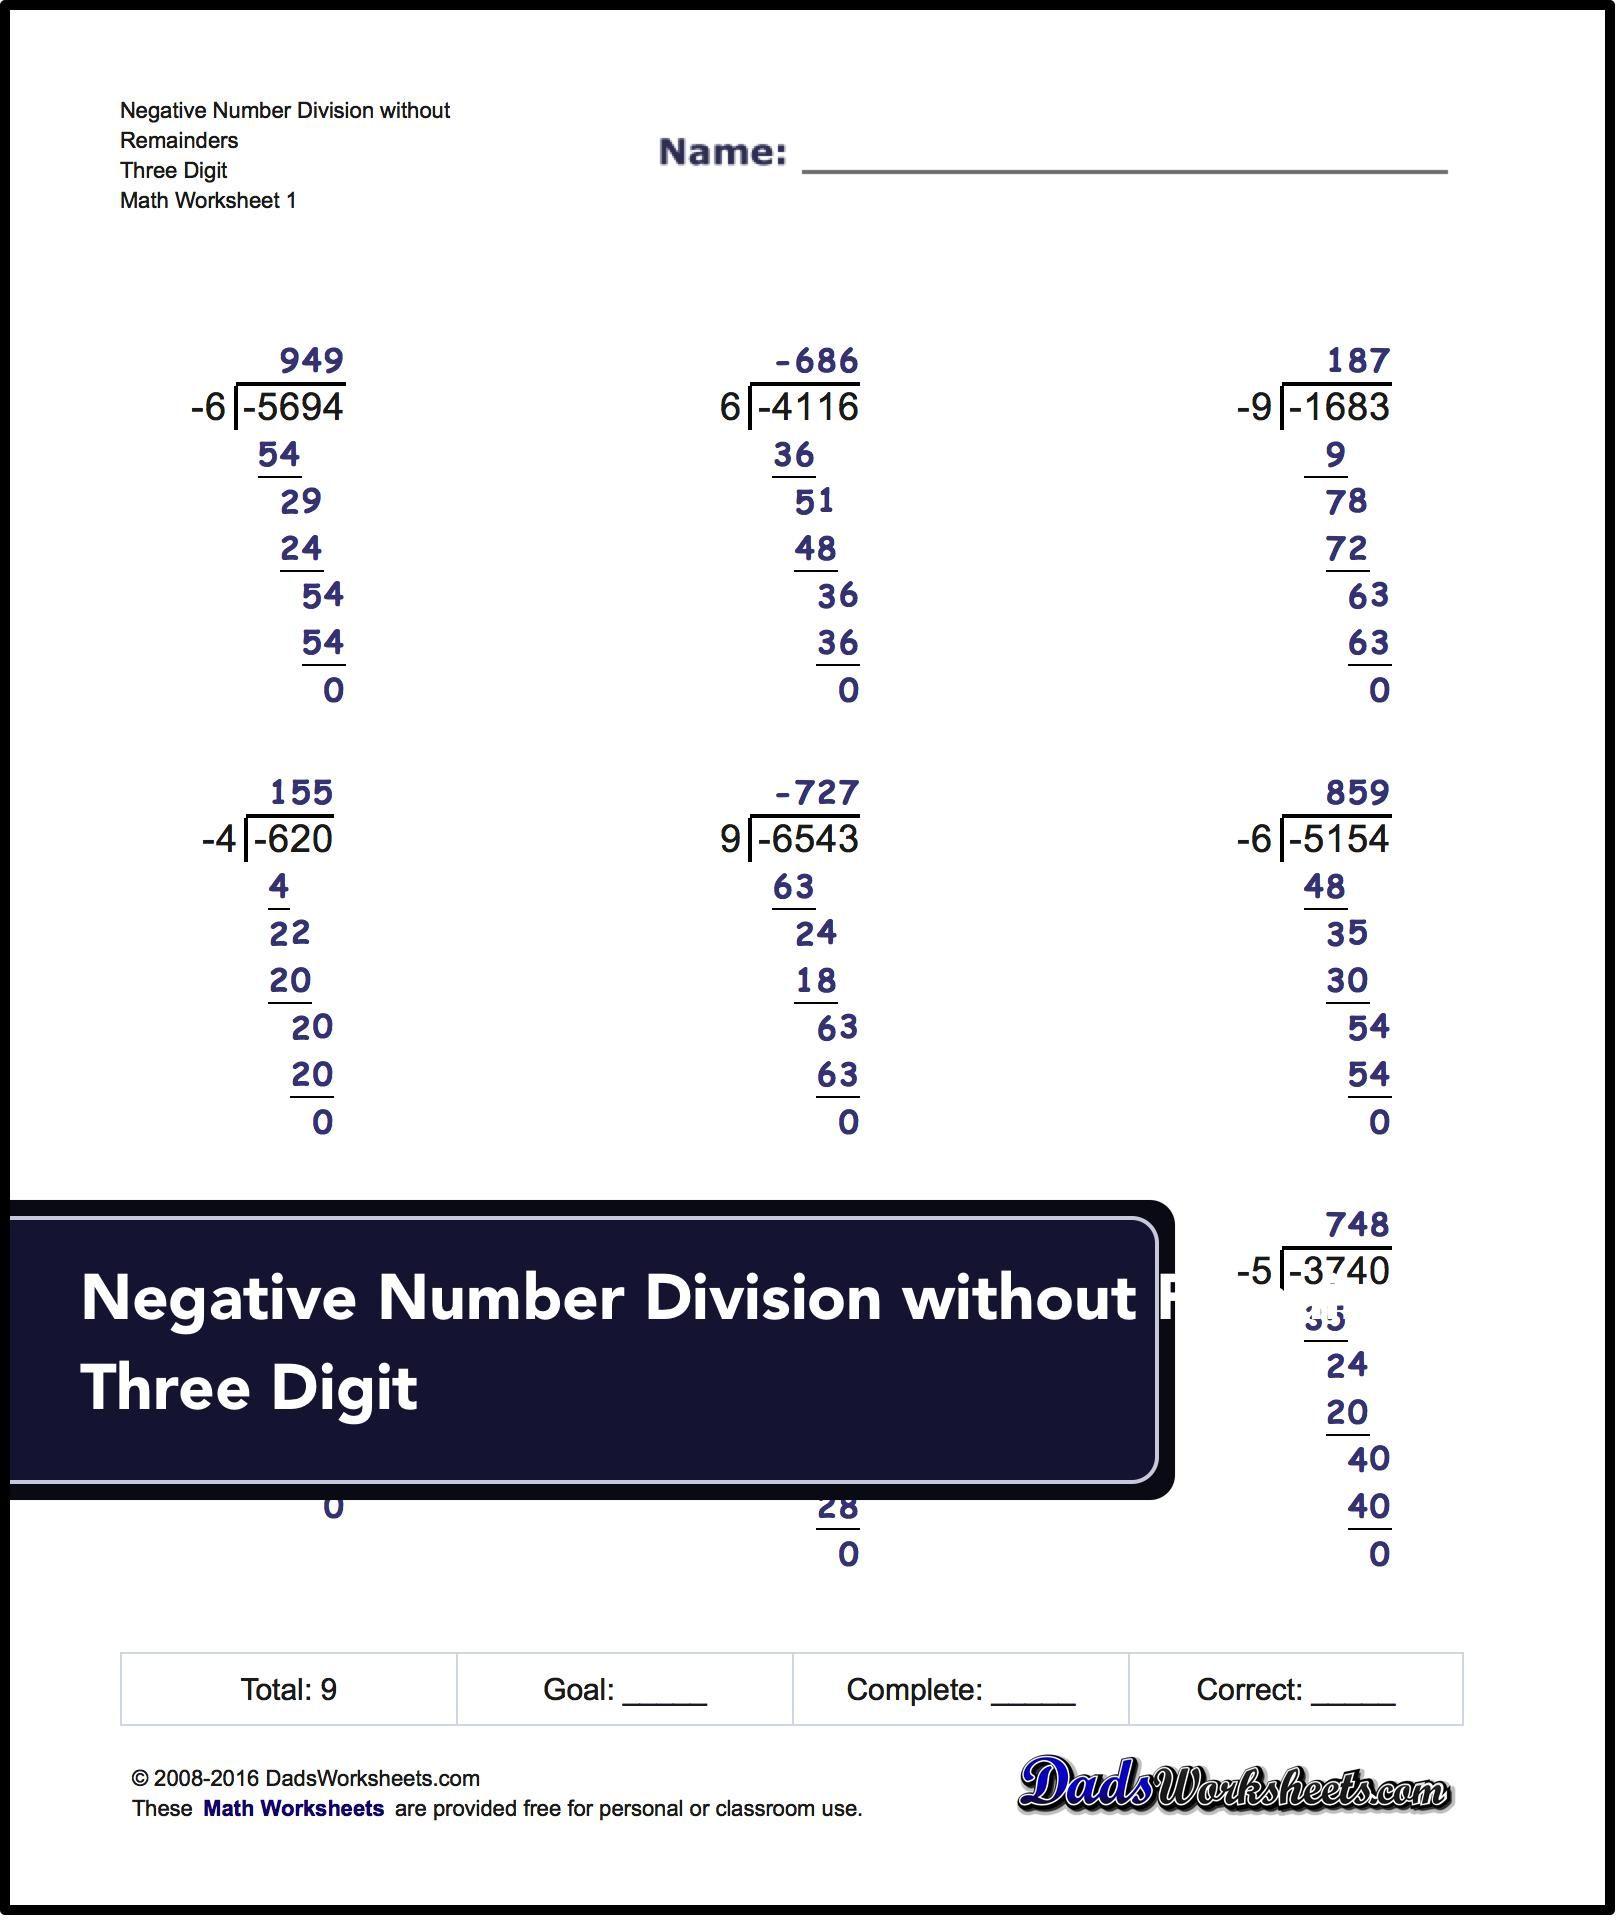 free math worksheets for negative numbers math worksheets pinterest negative numbers math. Black Bedroom Furniture Sets. Home Design Ideas